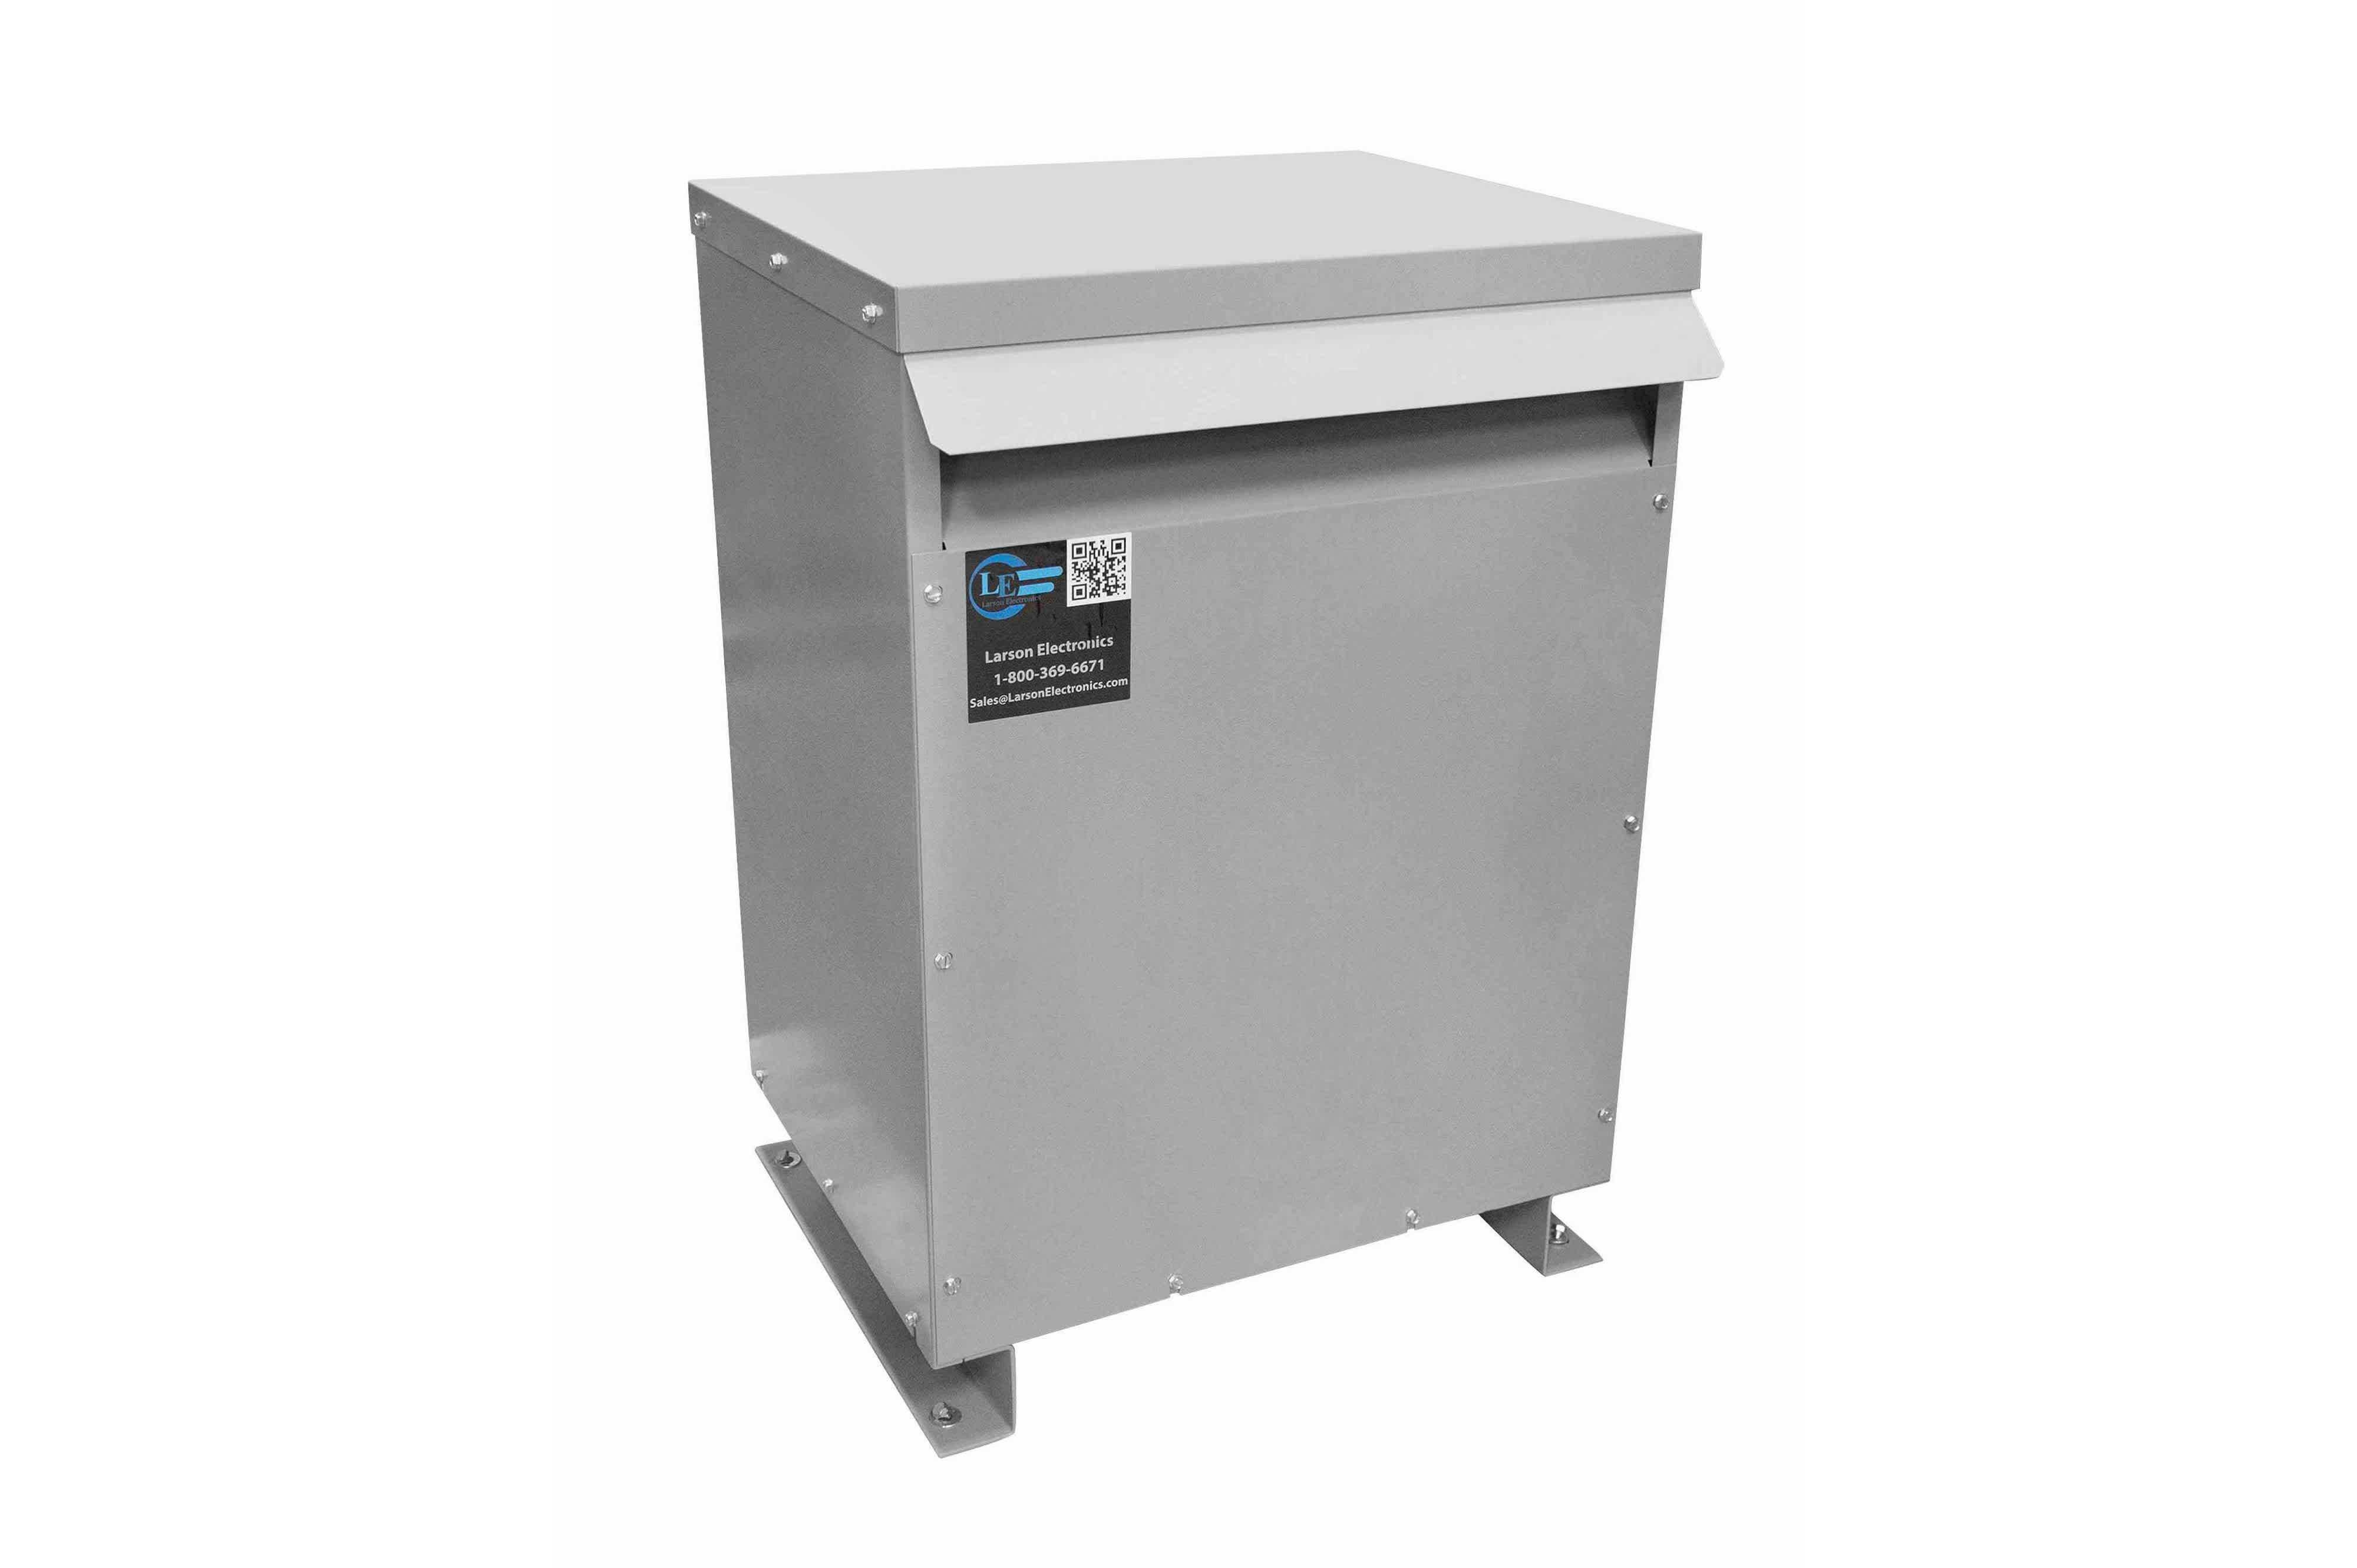 30 kVA 3PH Isolation Transformer, 208V Wye Primary, 600V Delta Secondary, N3R, Ventilated, 60 Hz